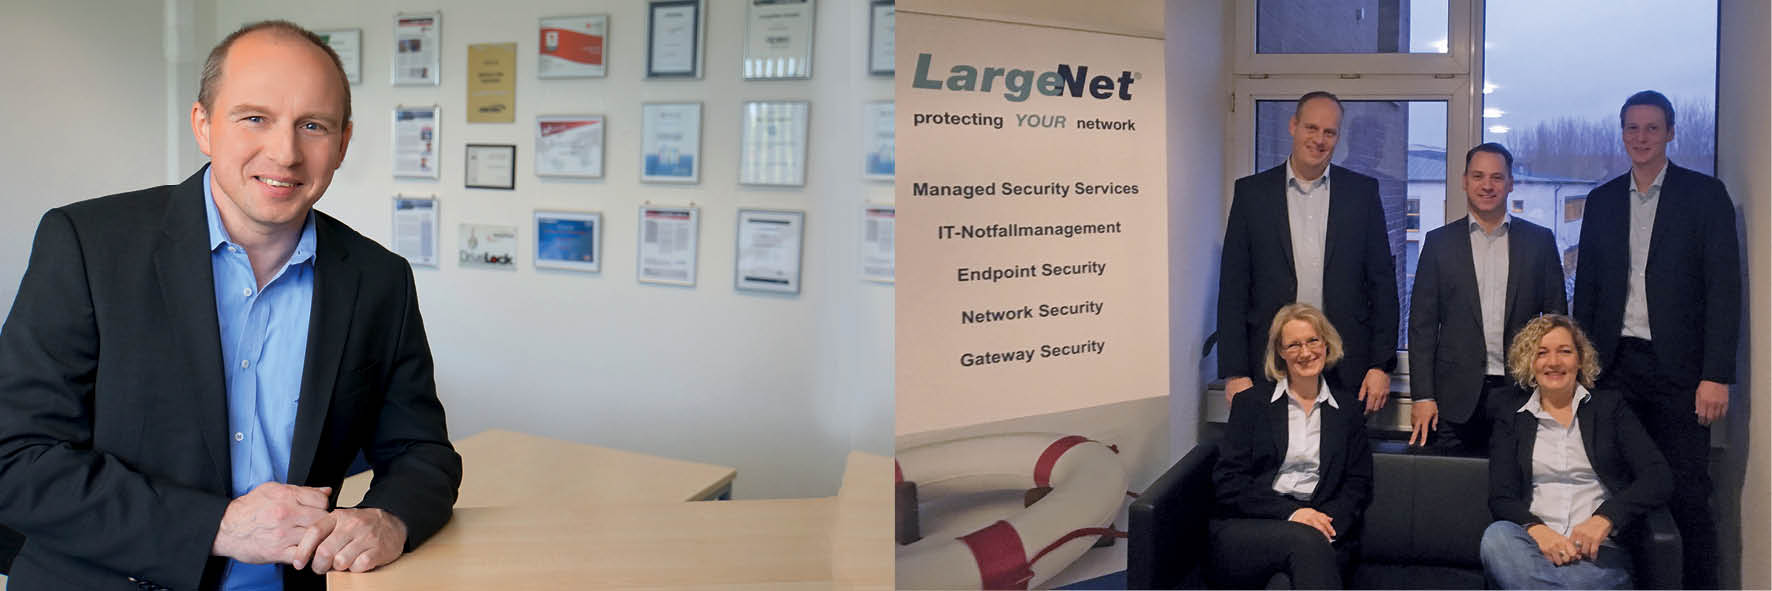 LargeNet ist STARKE MARKE des Monats April 2019